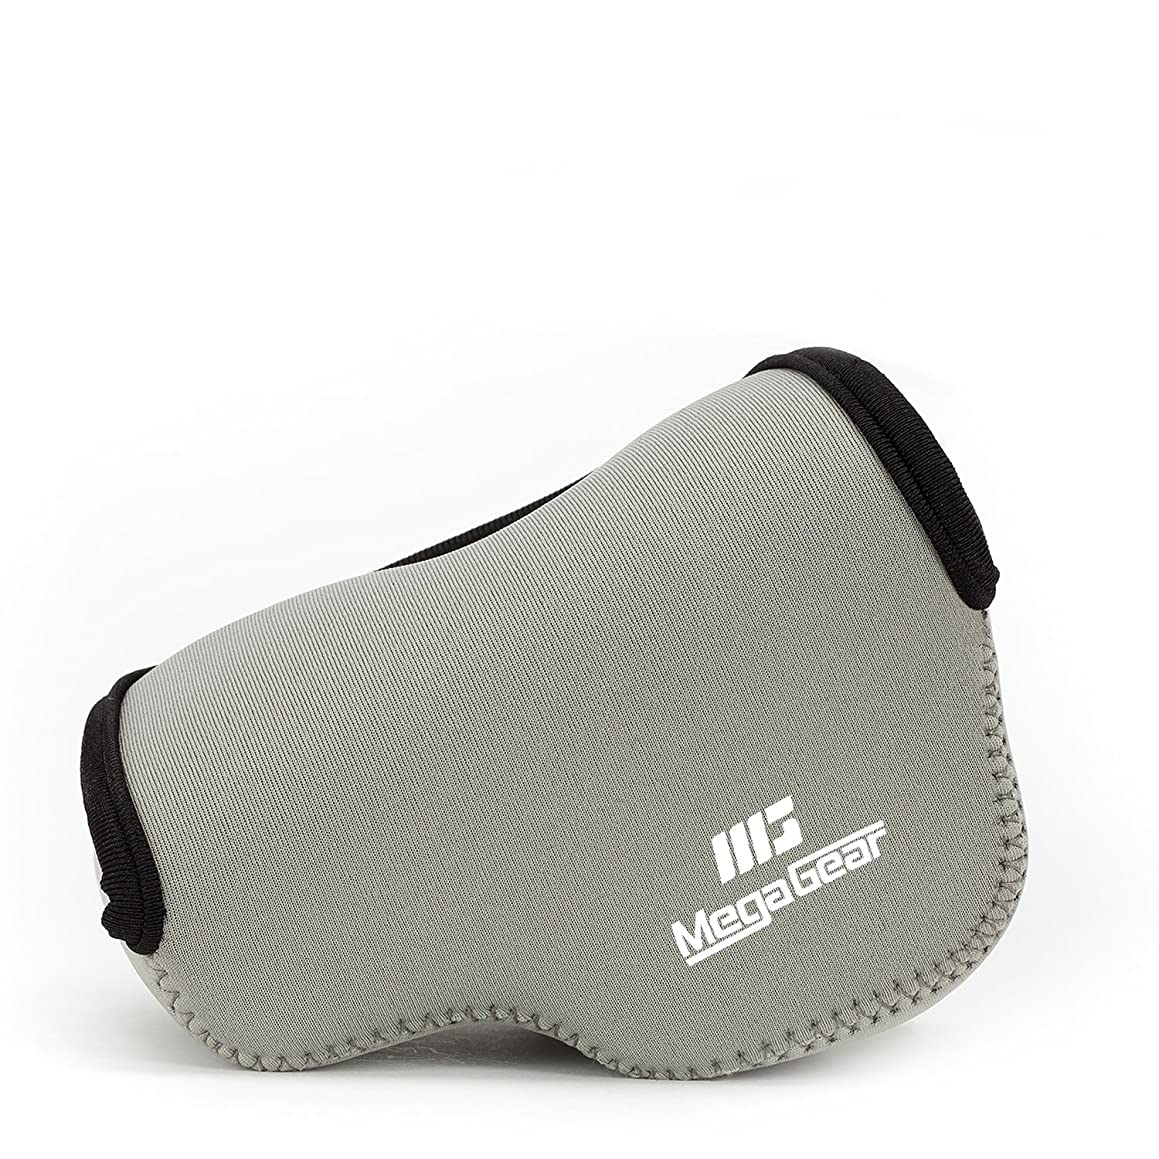 MegaGear ''Ultra Light'' Neoprene Camera Case Bag for Sony NEX-6, Sony NEX-7, Sony NEX-F3 with 16-50mm Lens (Gray)